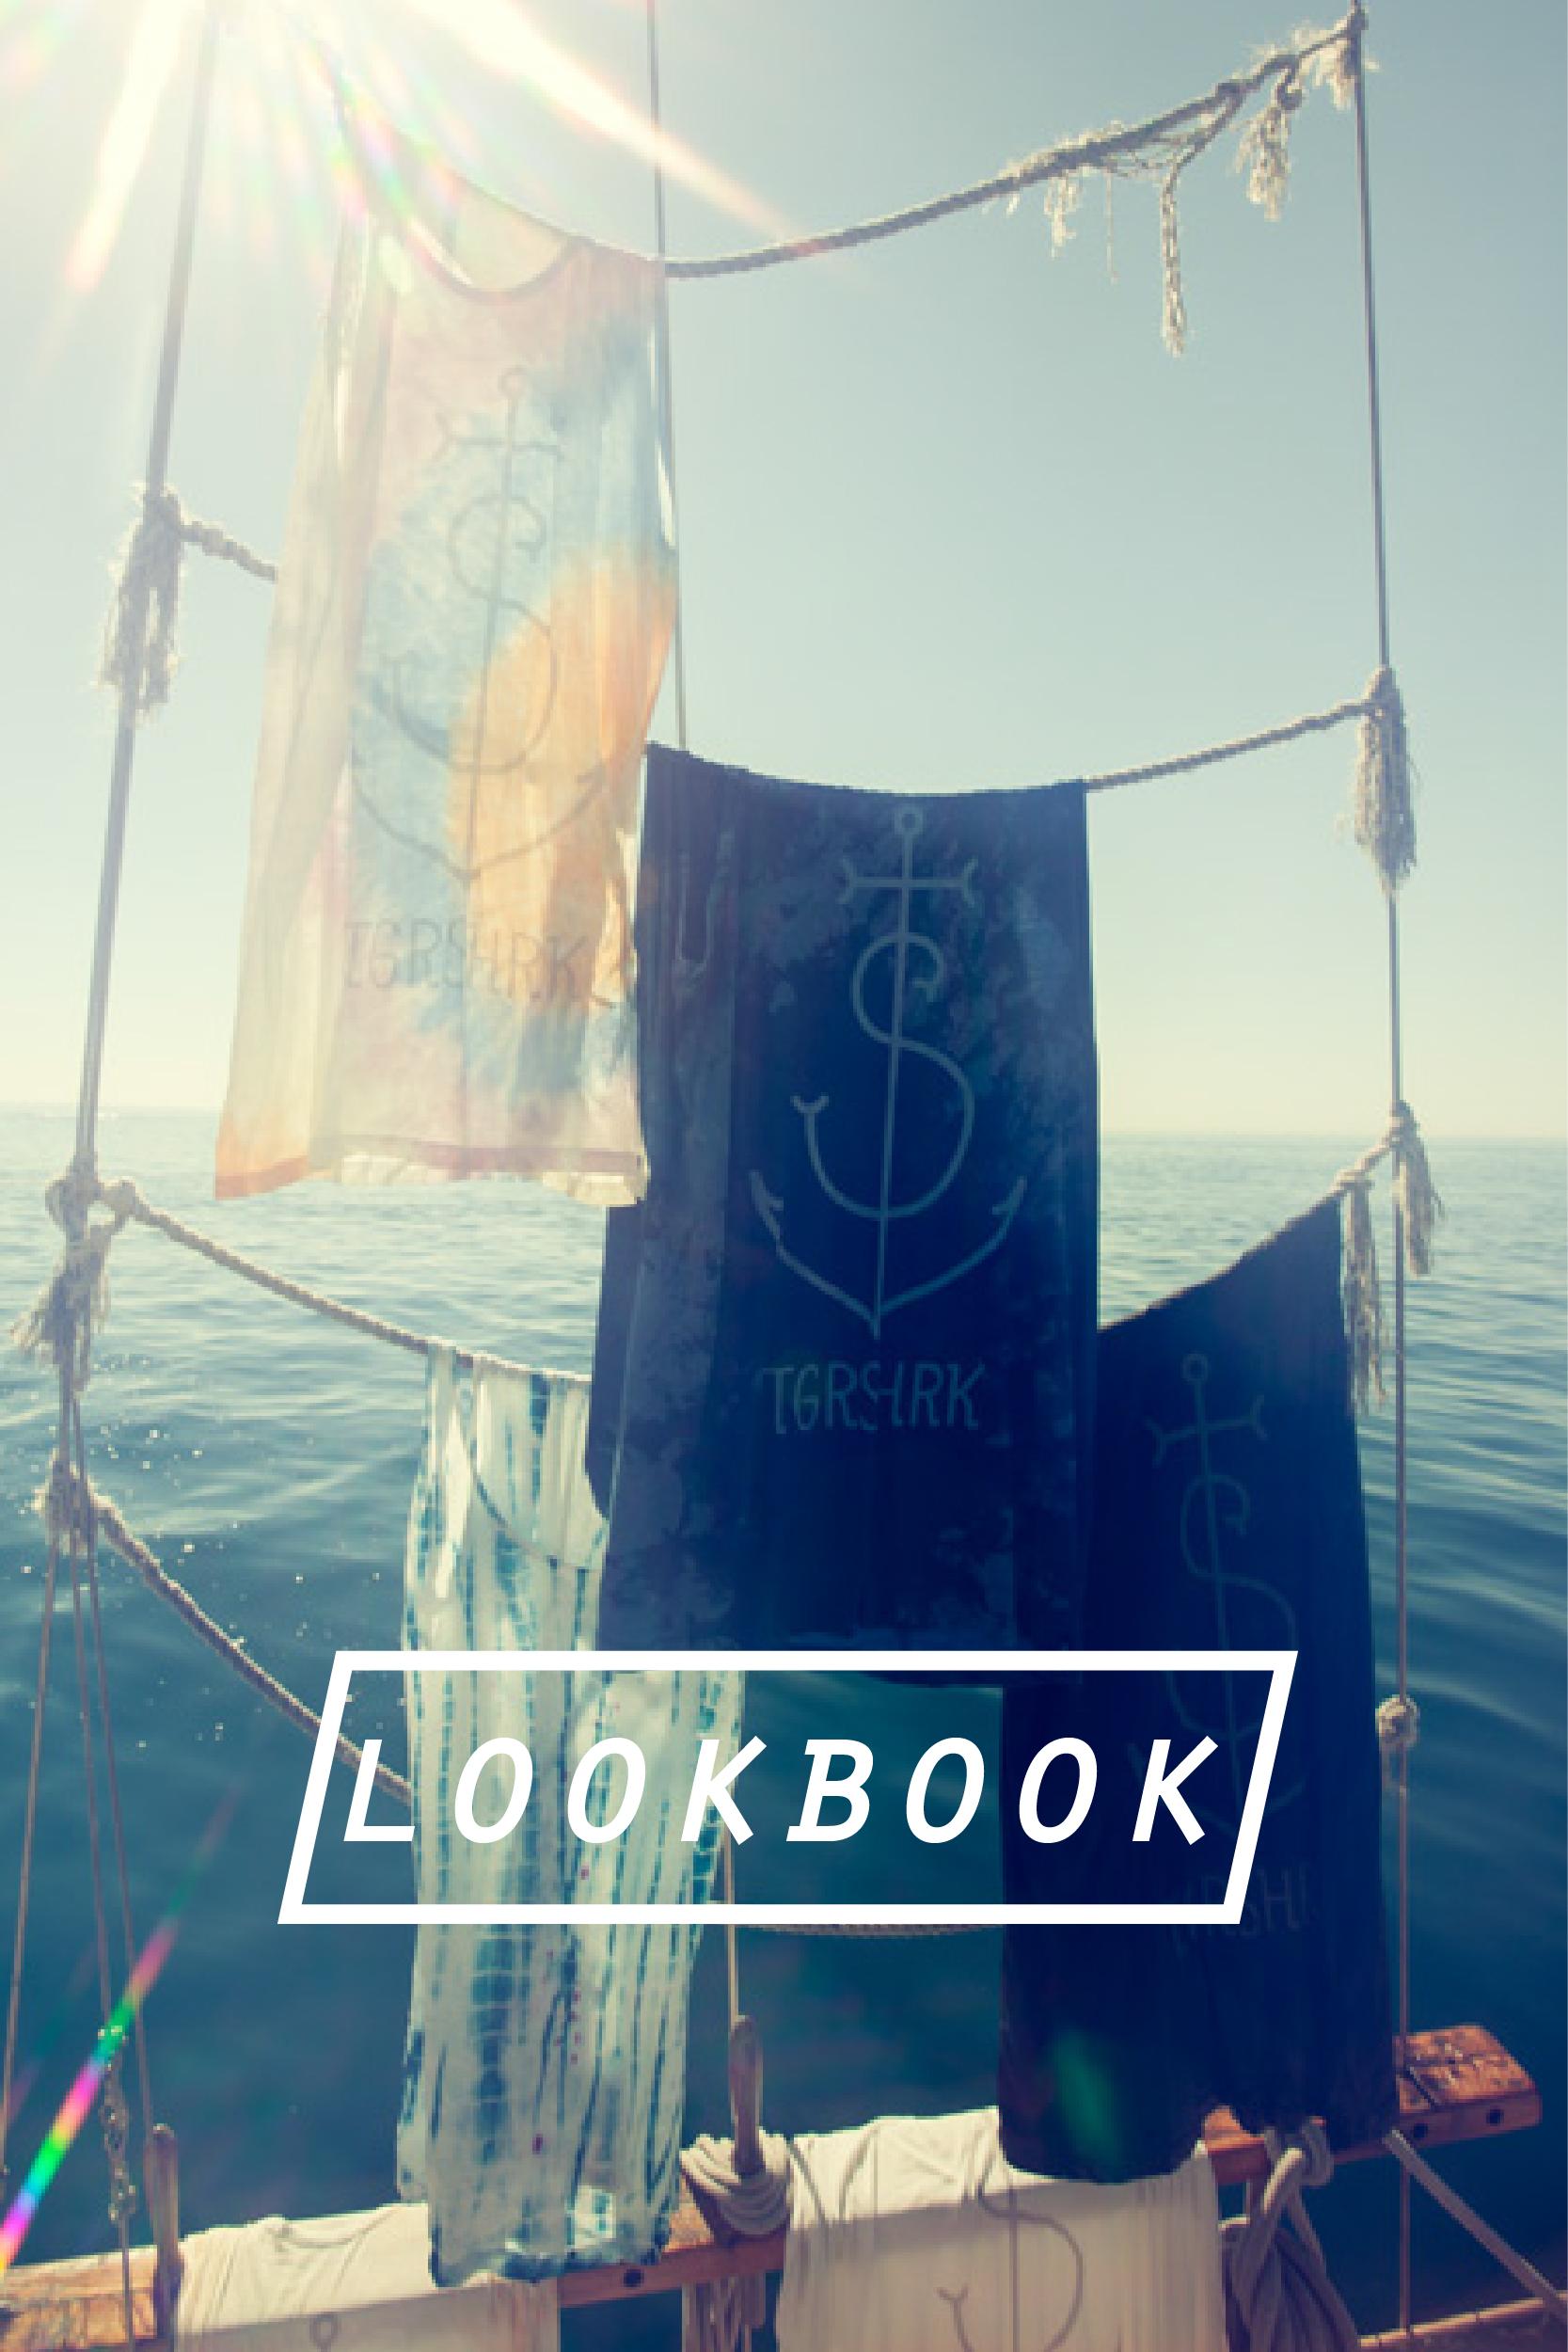 Lookbook_Thumbnail-01.jpg